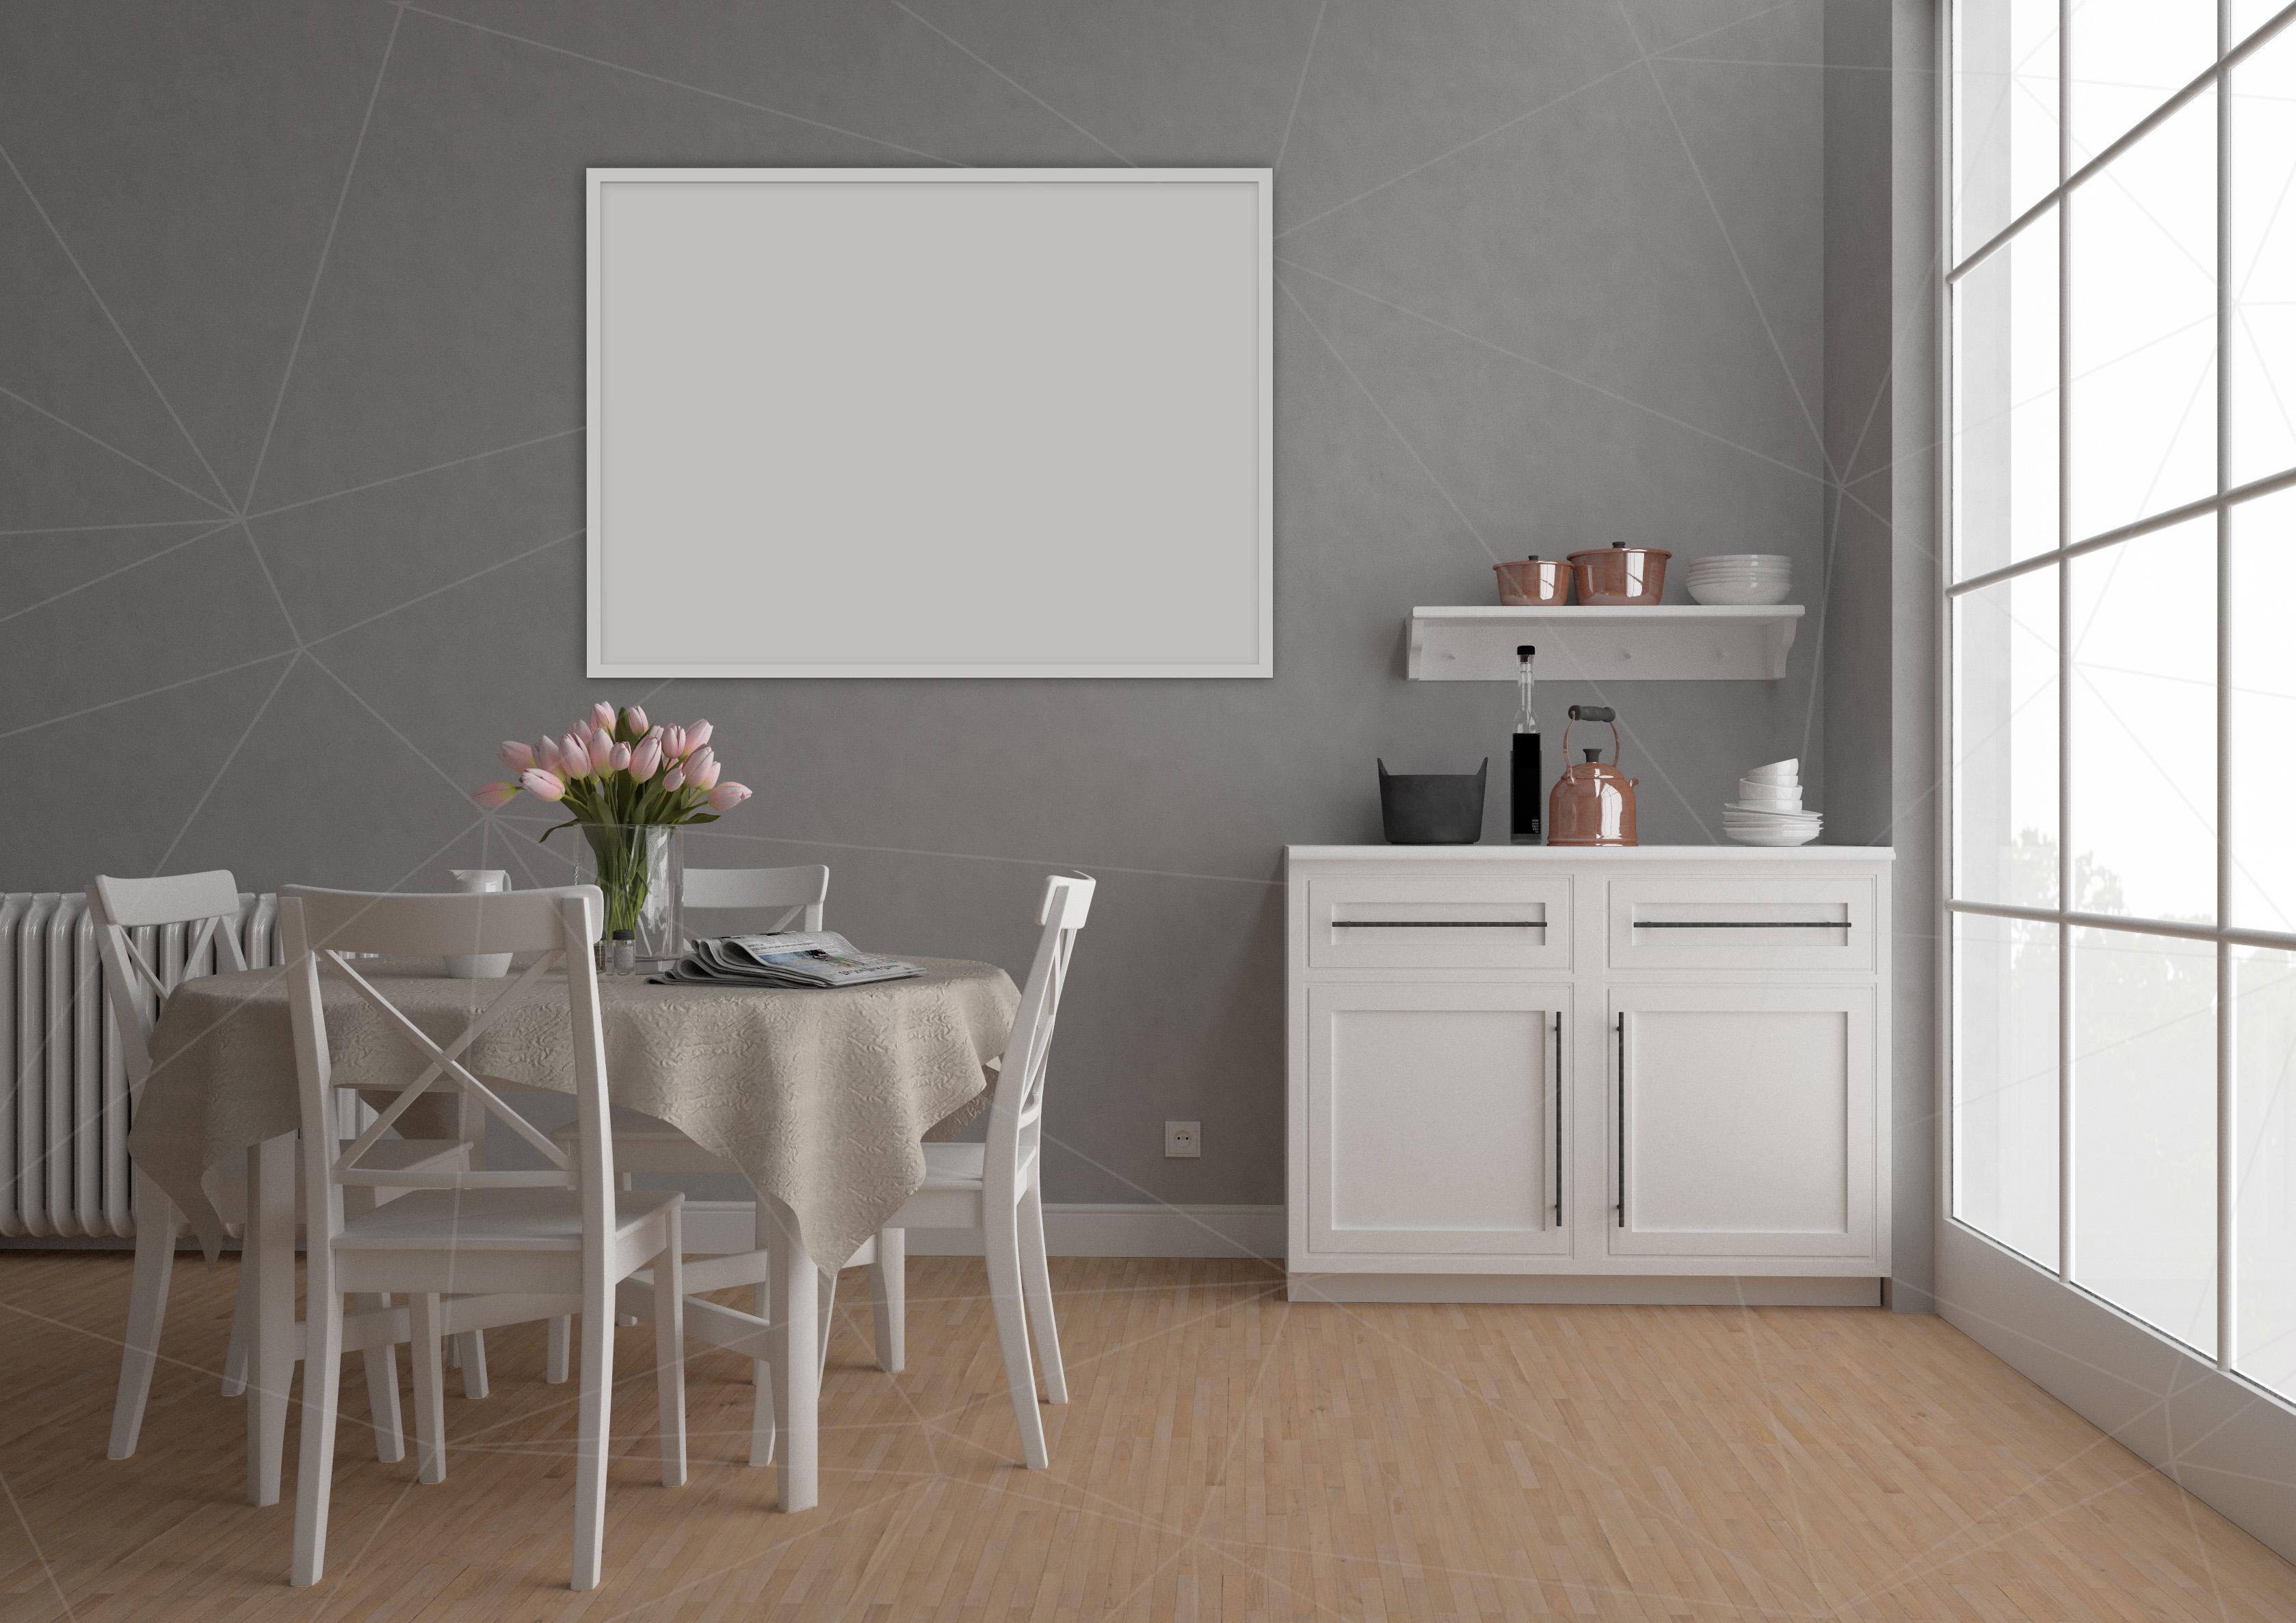 Interior mockup bundle - blank wall mock up example image 5